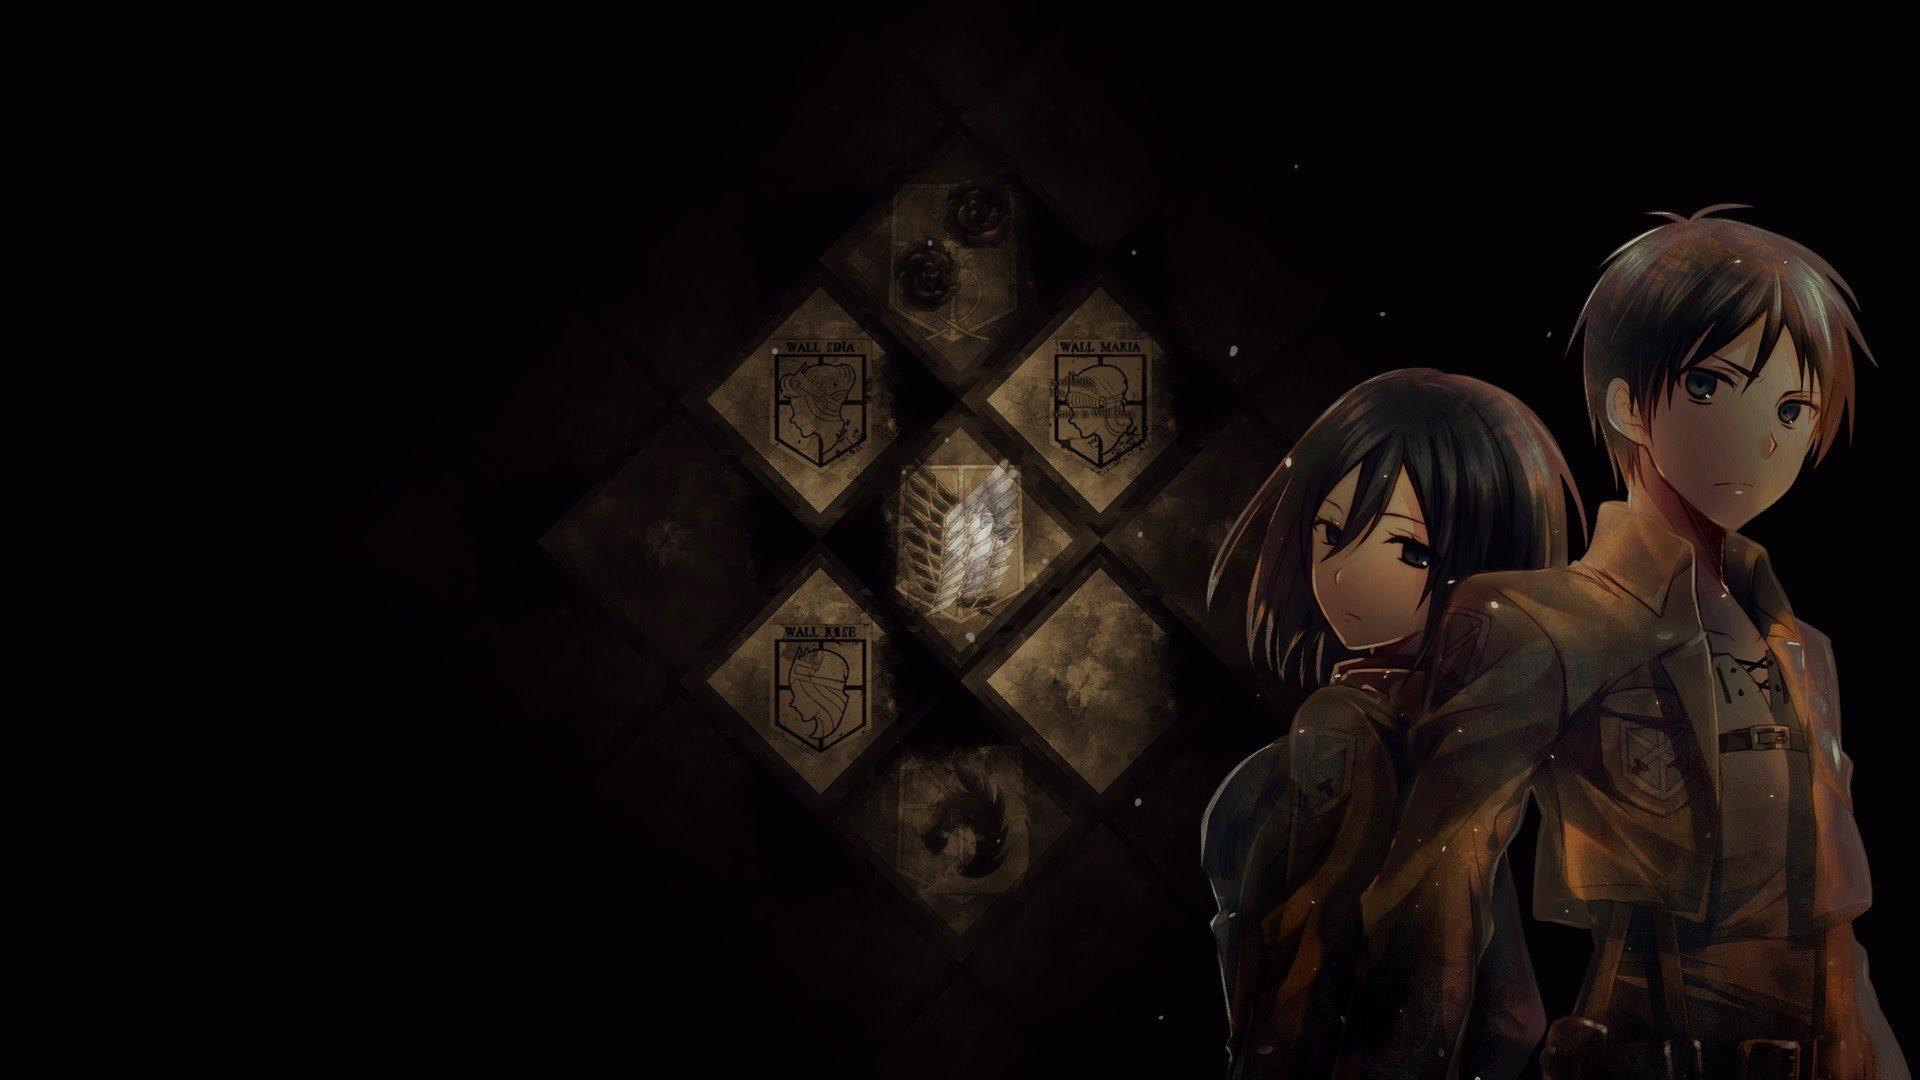 Attack On Titan Hd Wallpaper Background Image 1920x1080